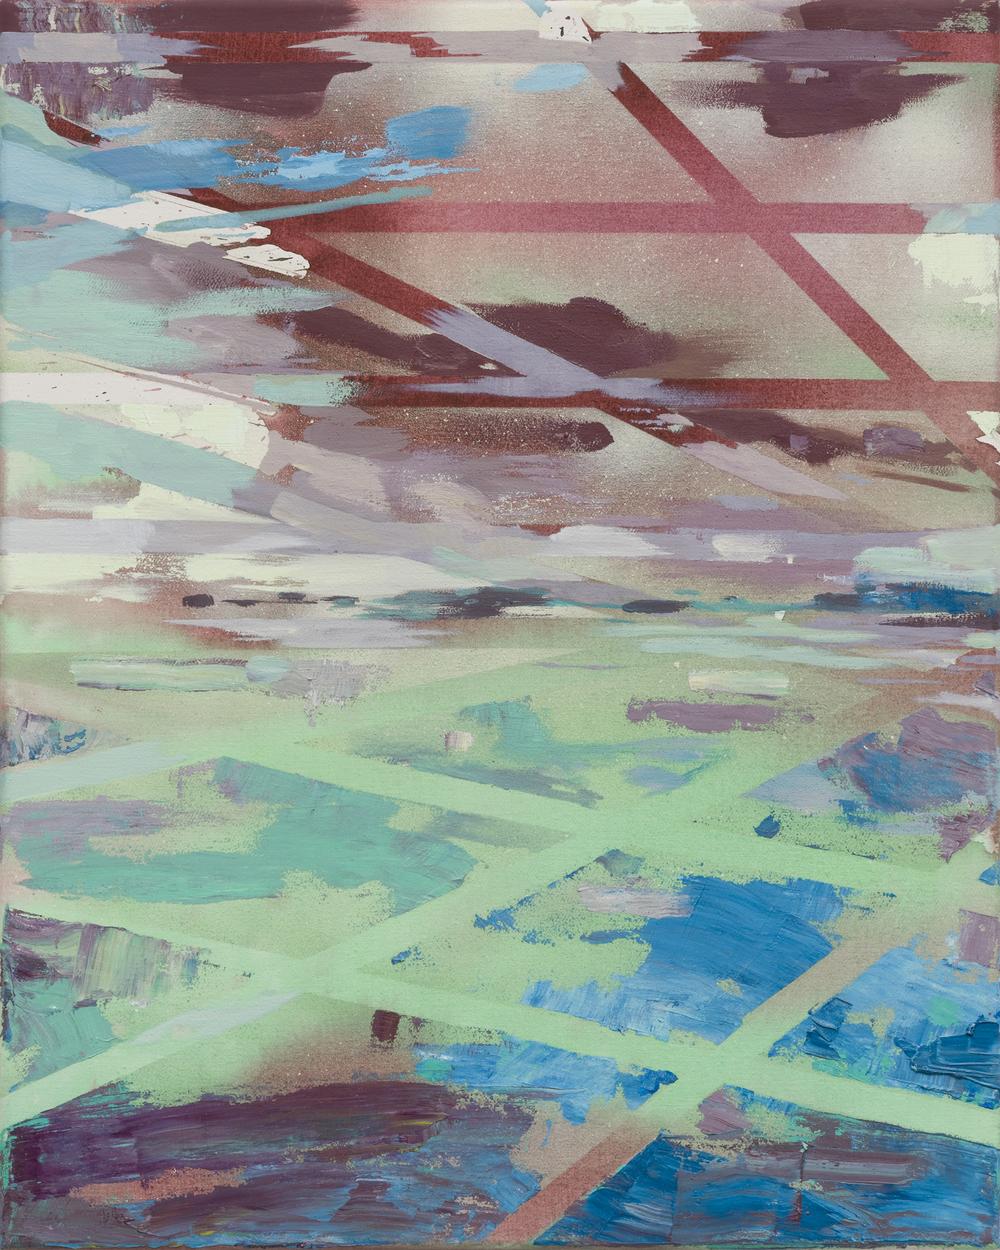 Vector, 2016, 50 x 40 cm, mixed media on canvas